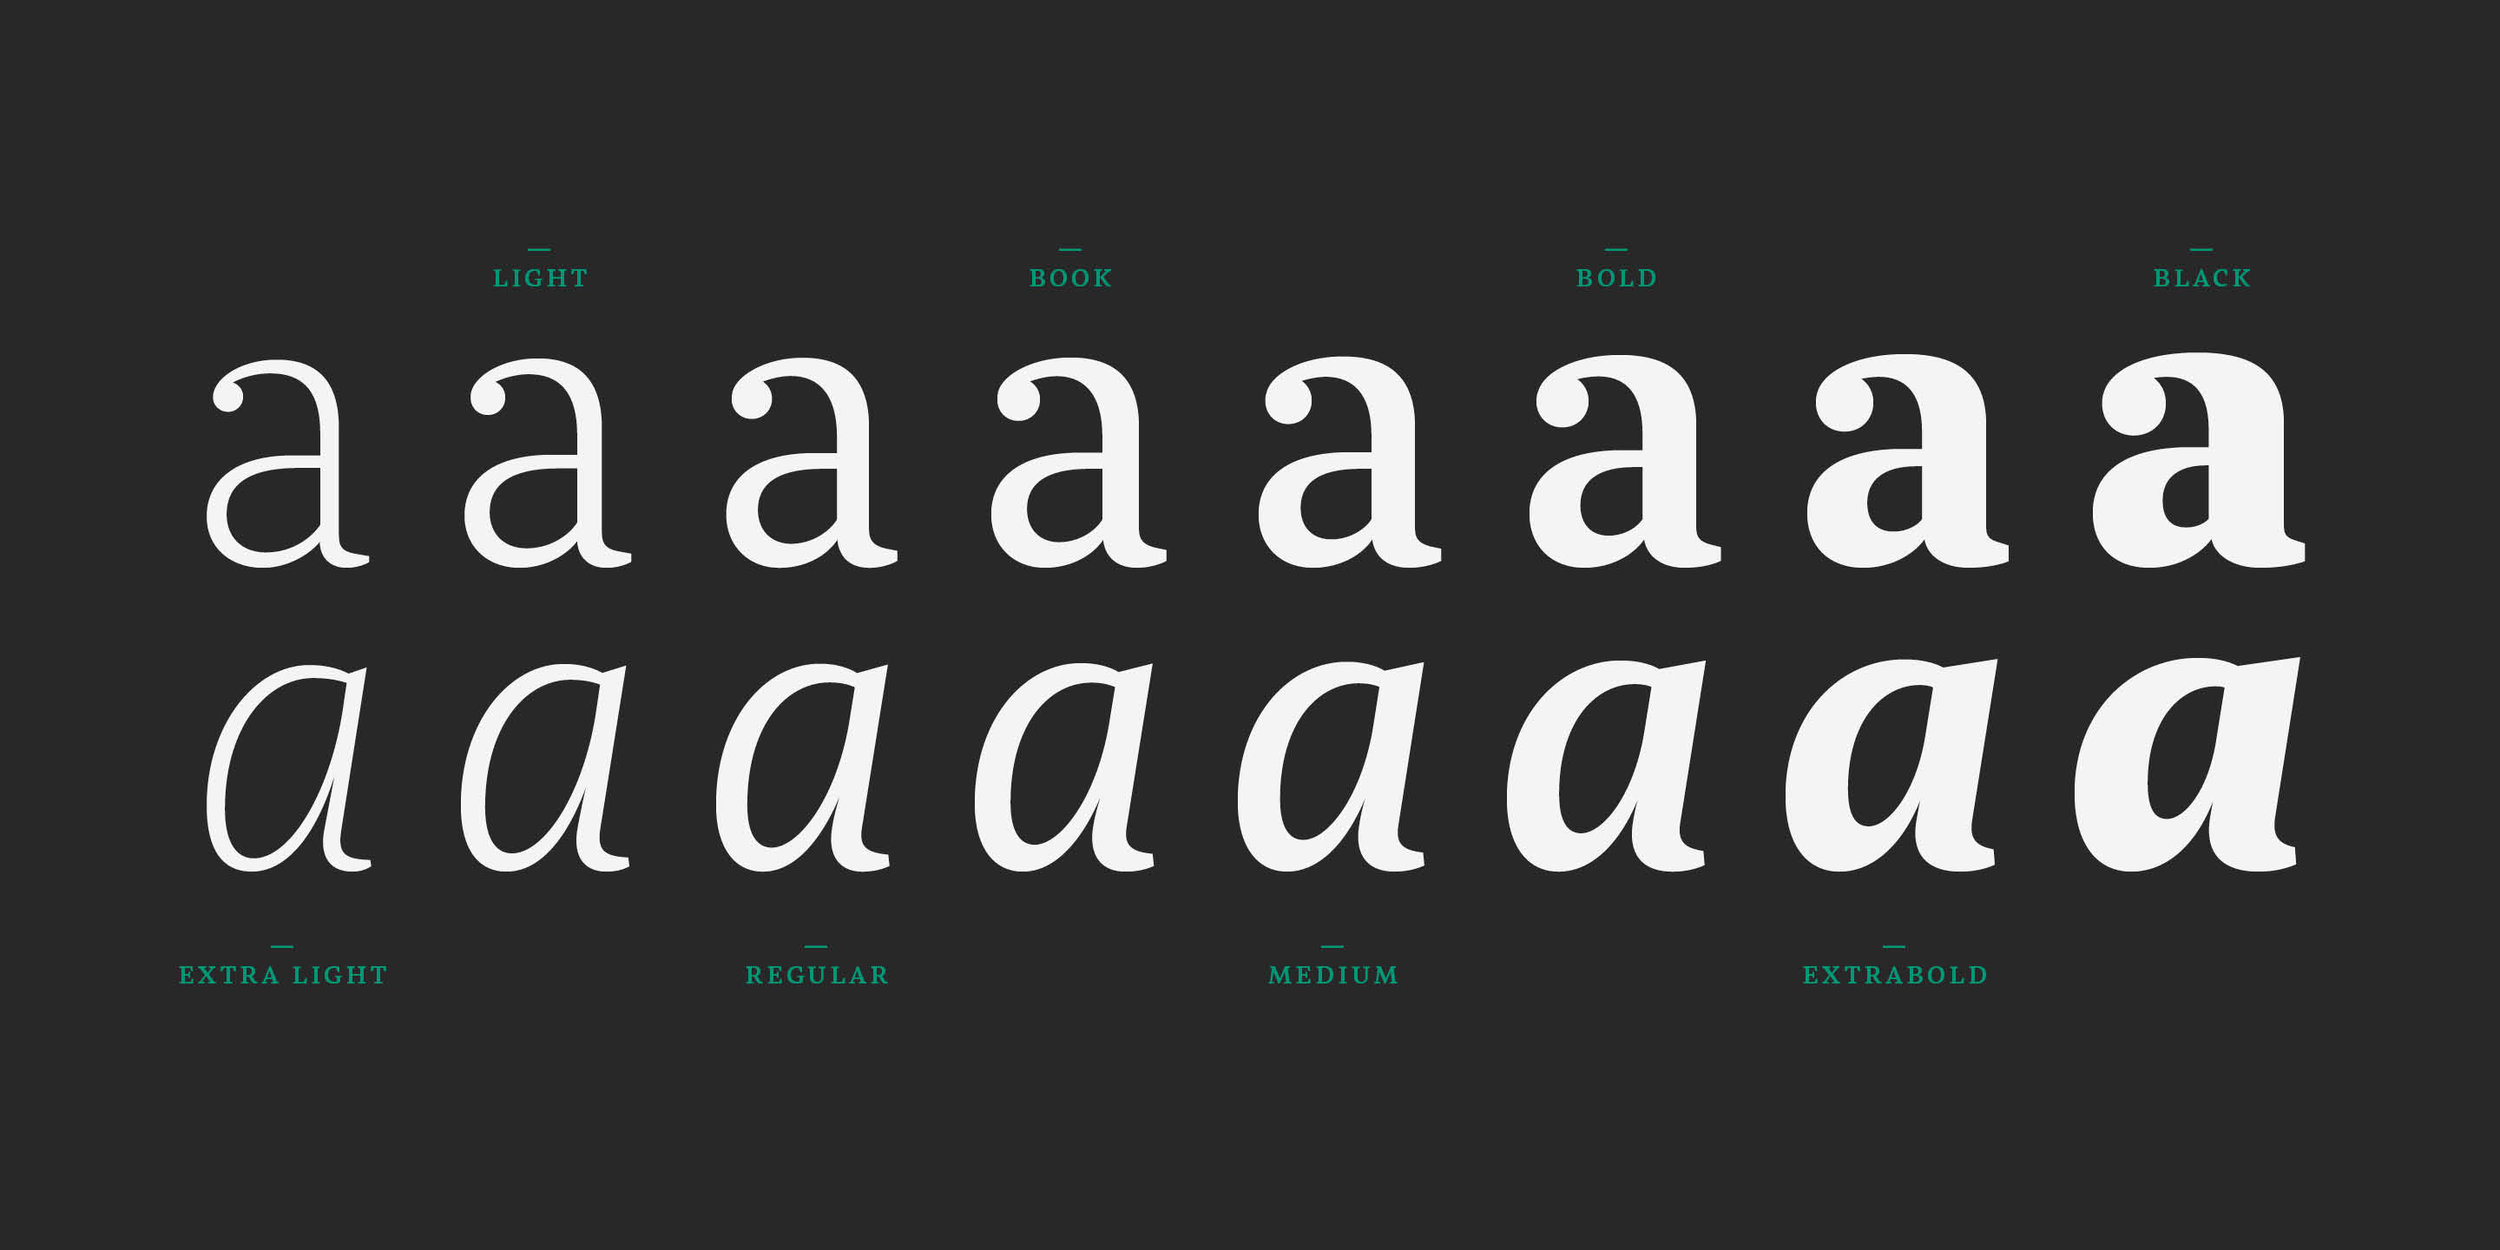 MeretPro-TypeMates-newspaper-editorial-typeface-font-2018-6.jpg